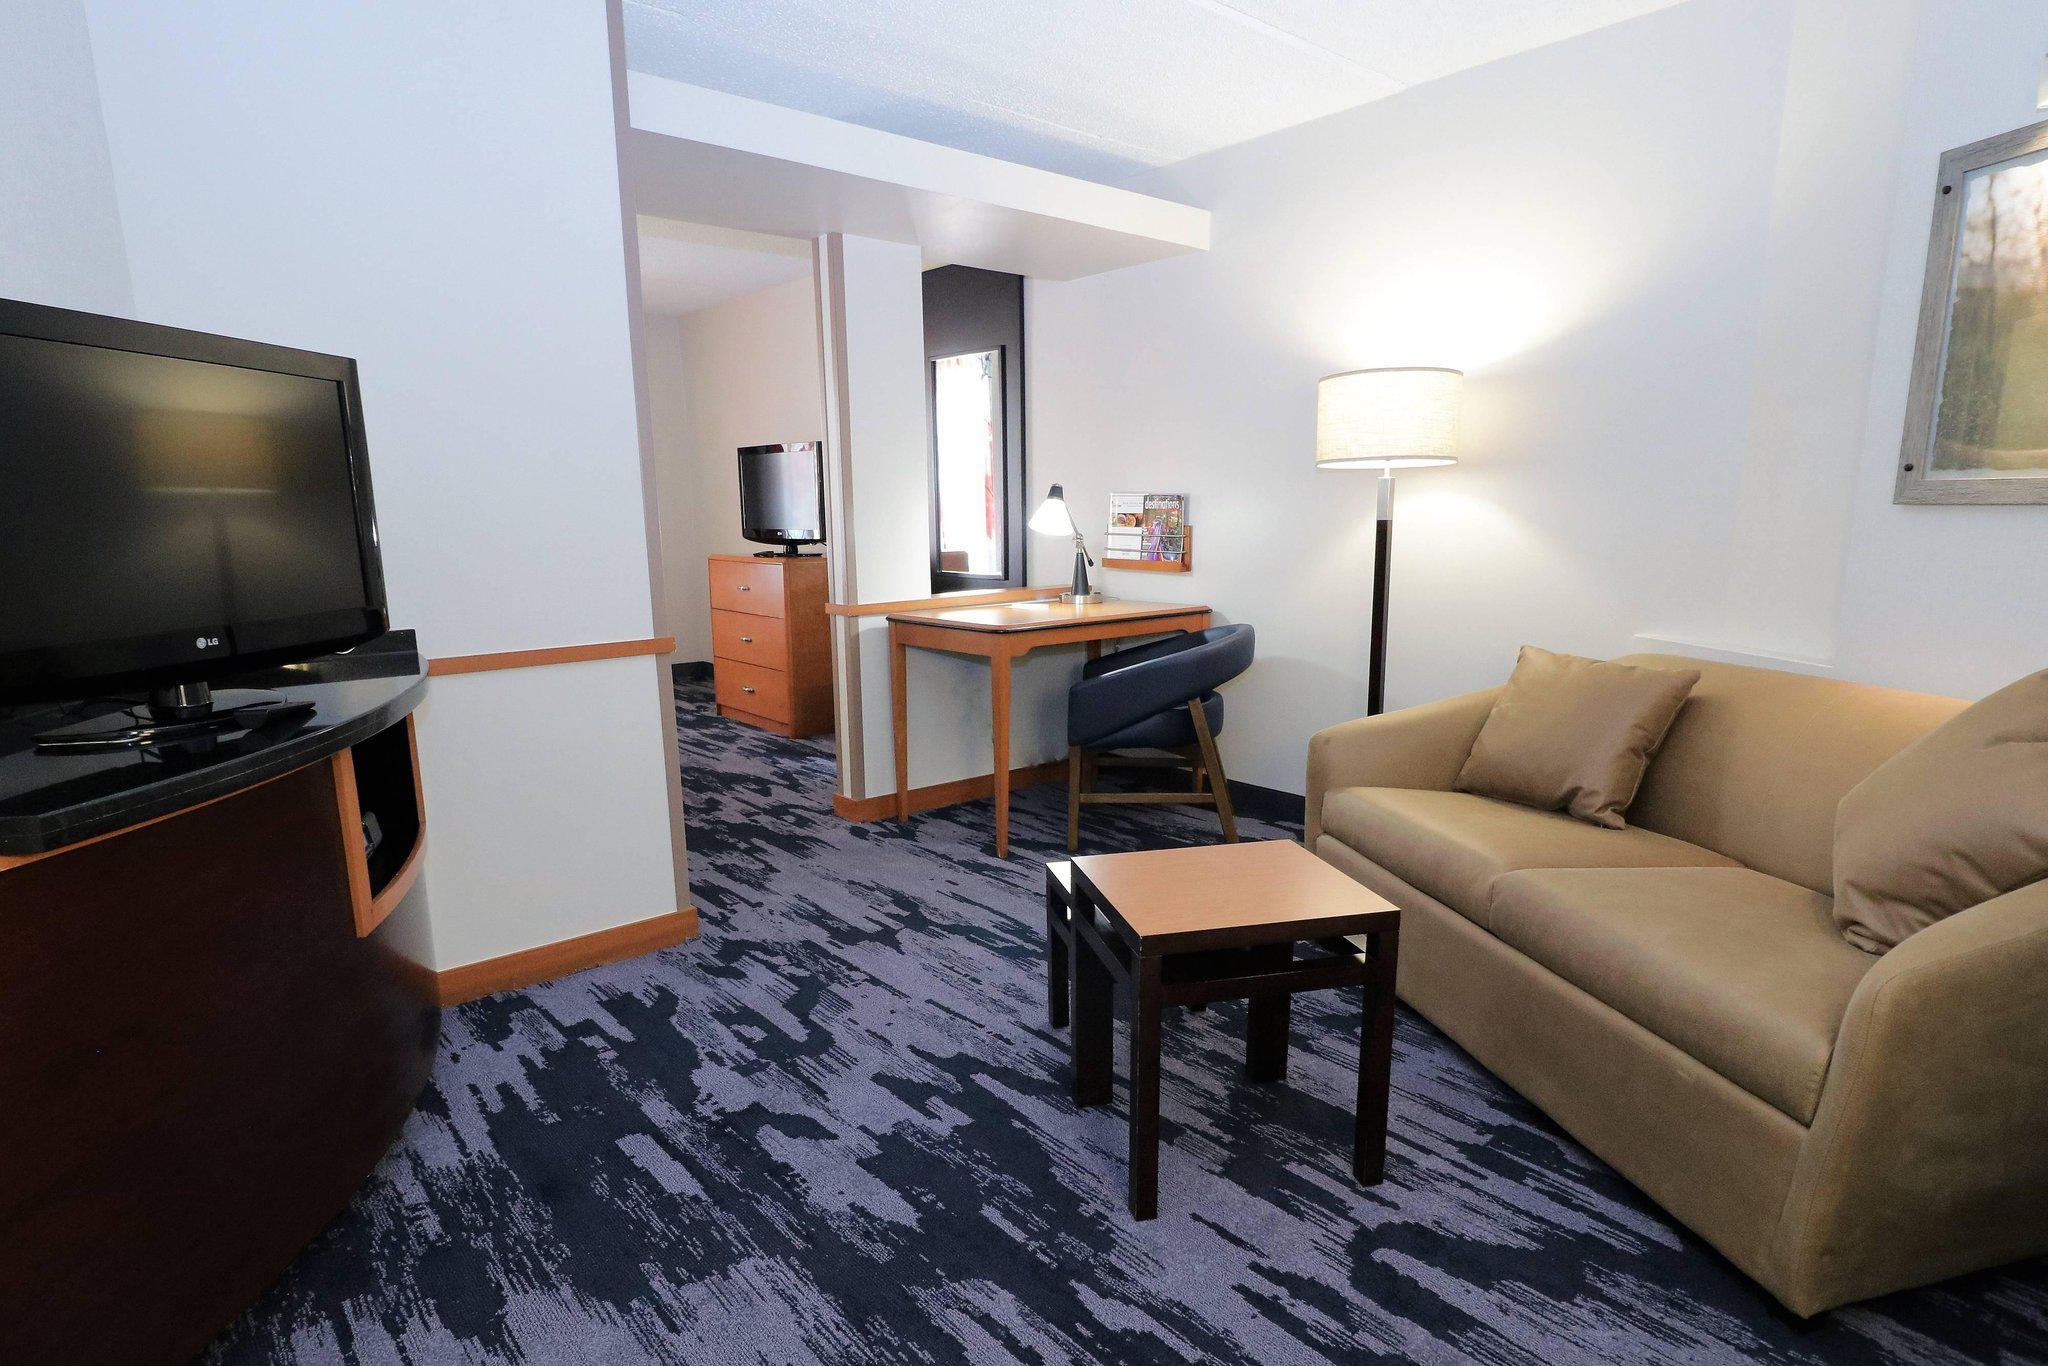 Fairfield Inn & Suites by Marriott San Antonio Alamo Plaza/Convention Center